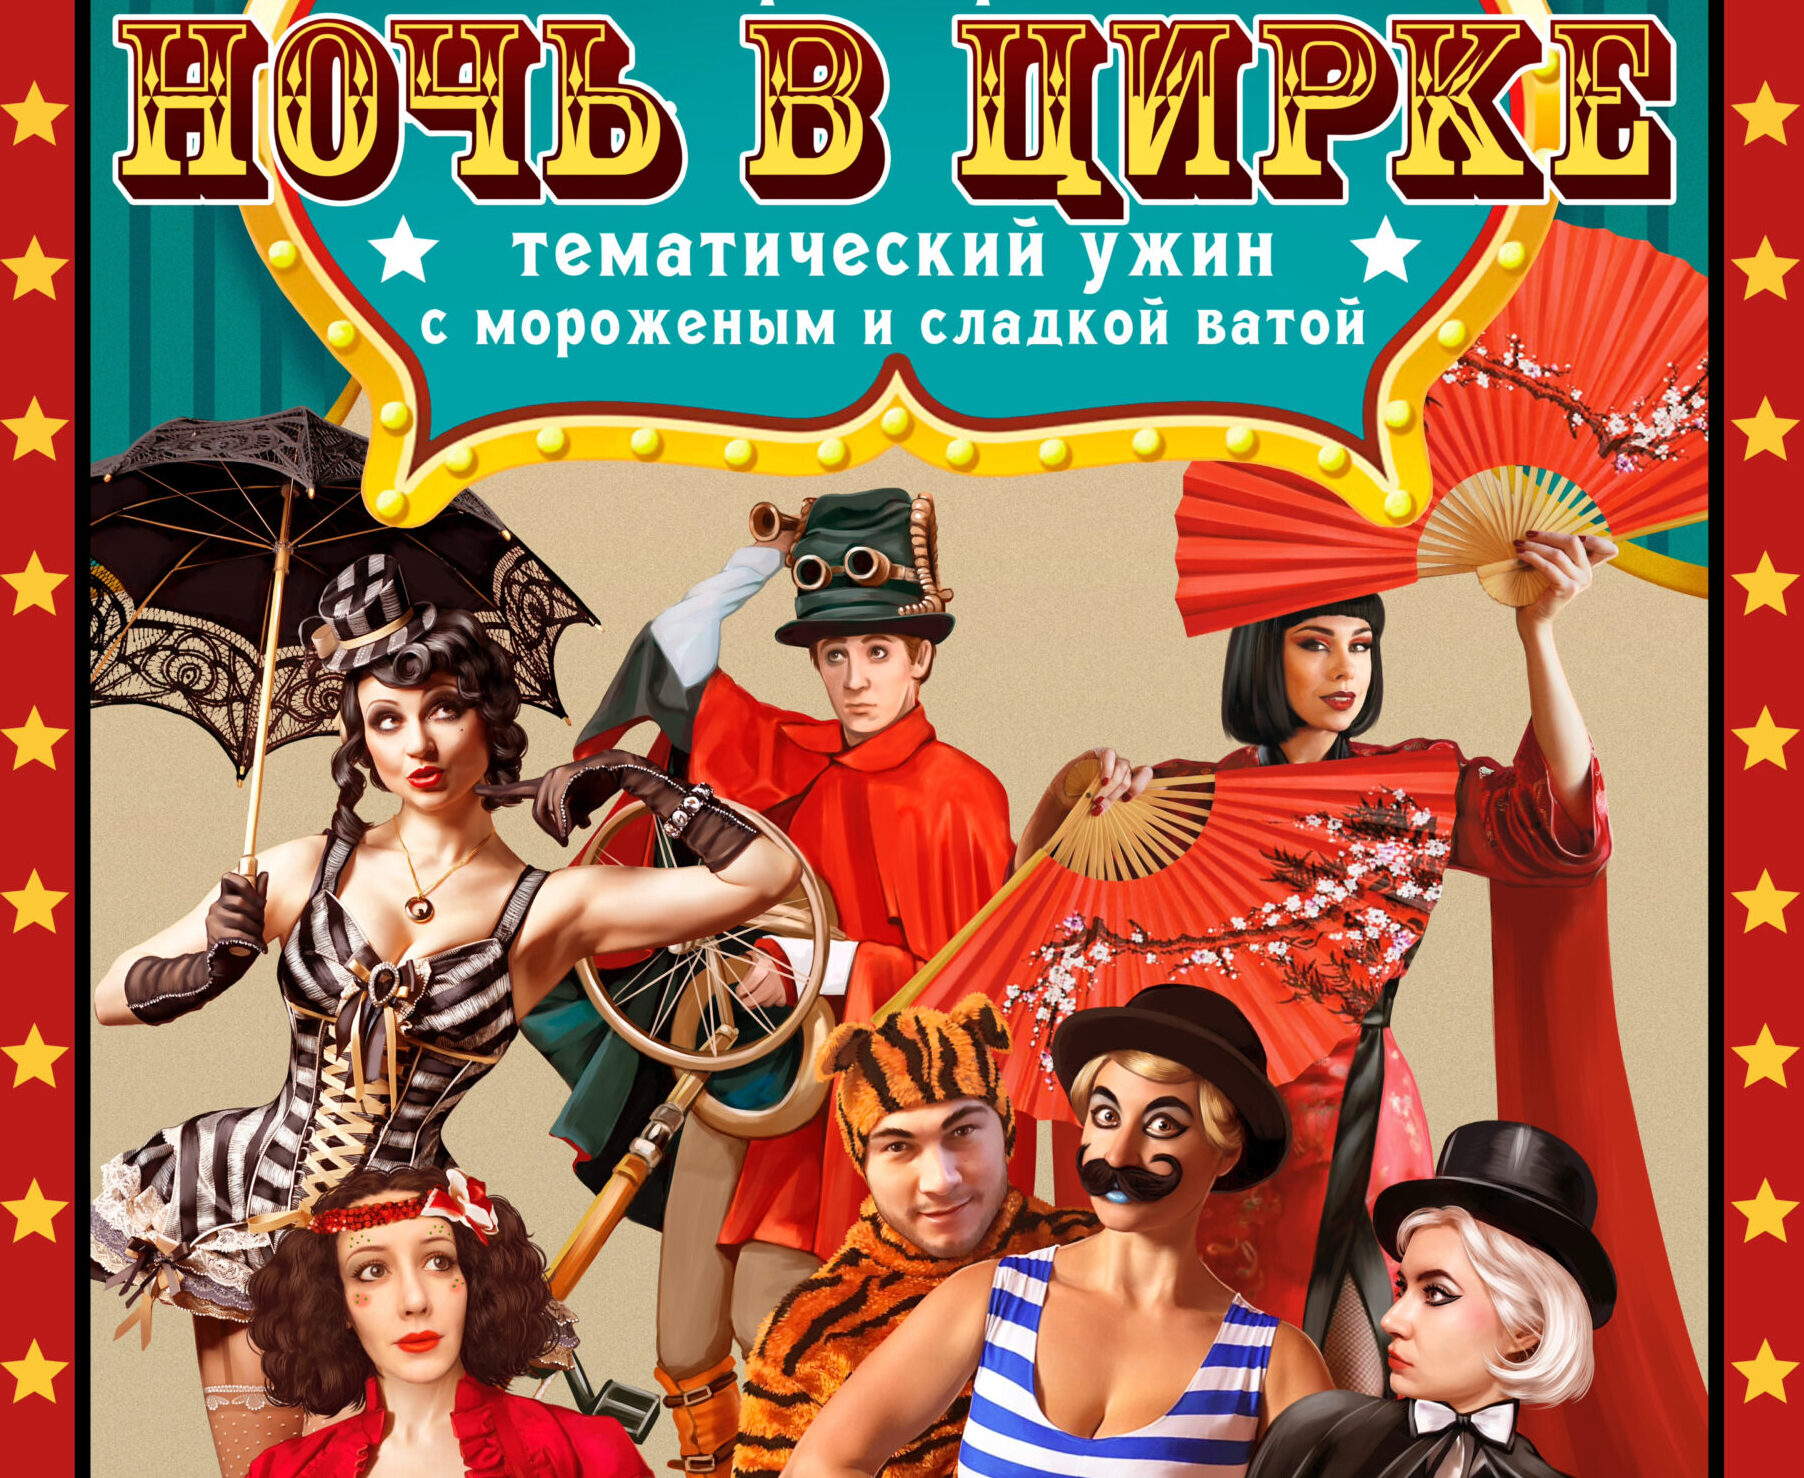 Афиша! Бурлеск-кабаре с оркестром «Ночь в Цирке» 06 февраля в Embers Speakeasy